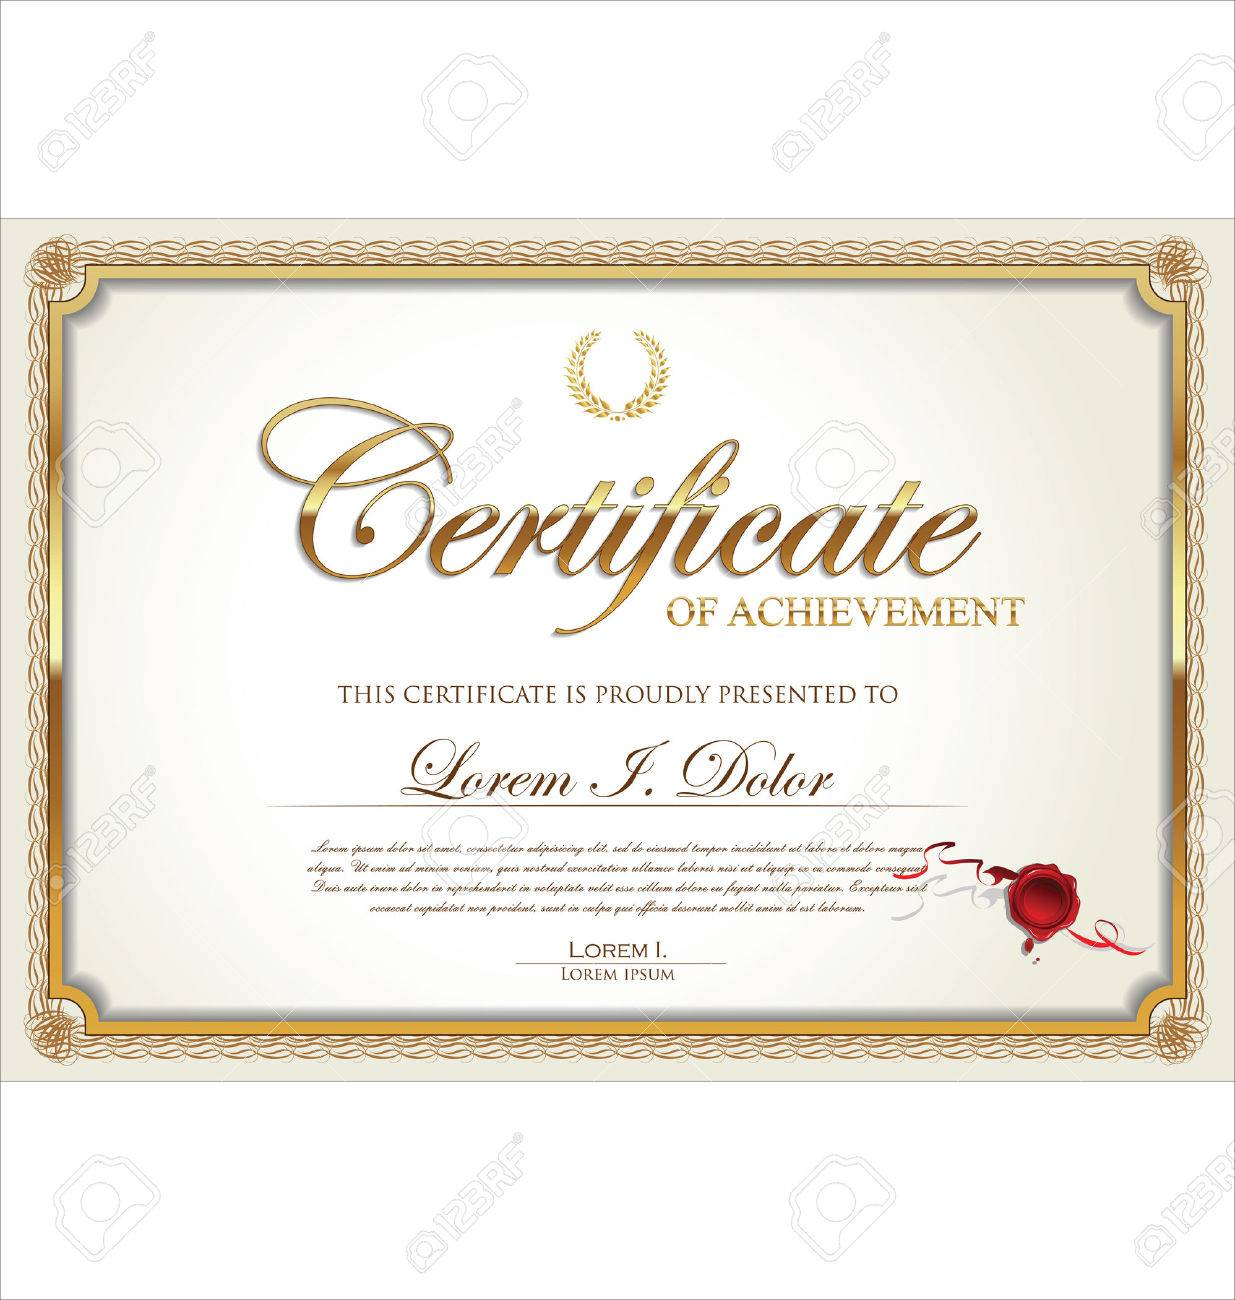 Golden Certificate Of Achievement Template Vector Illustration